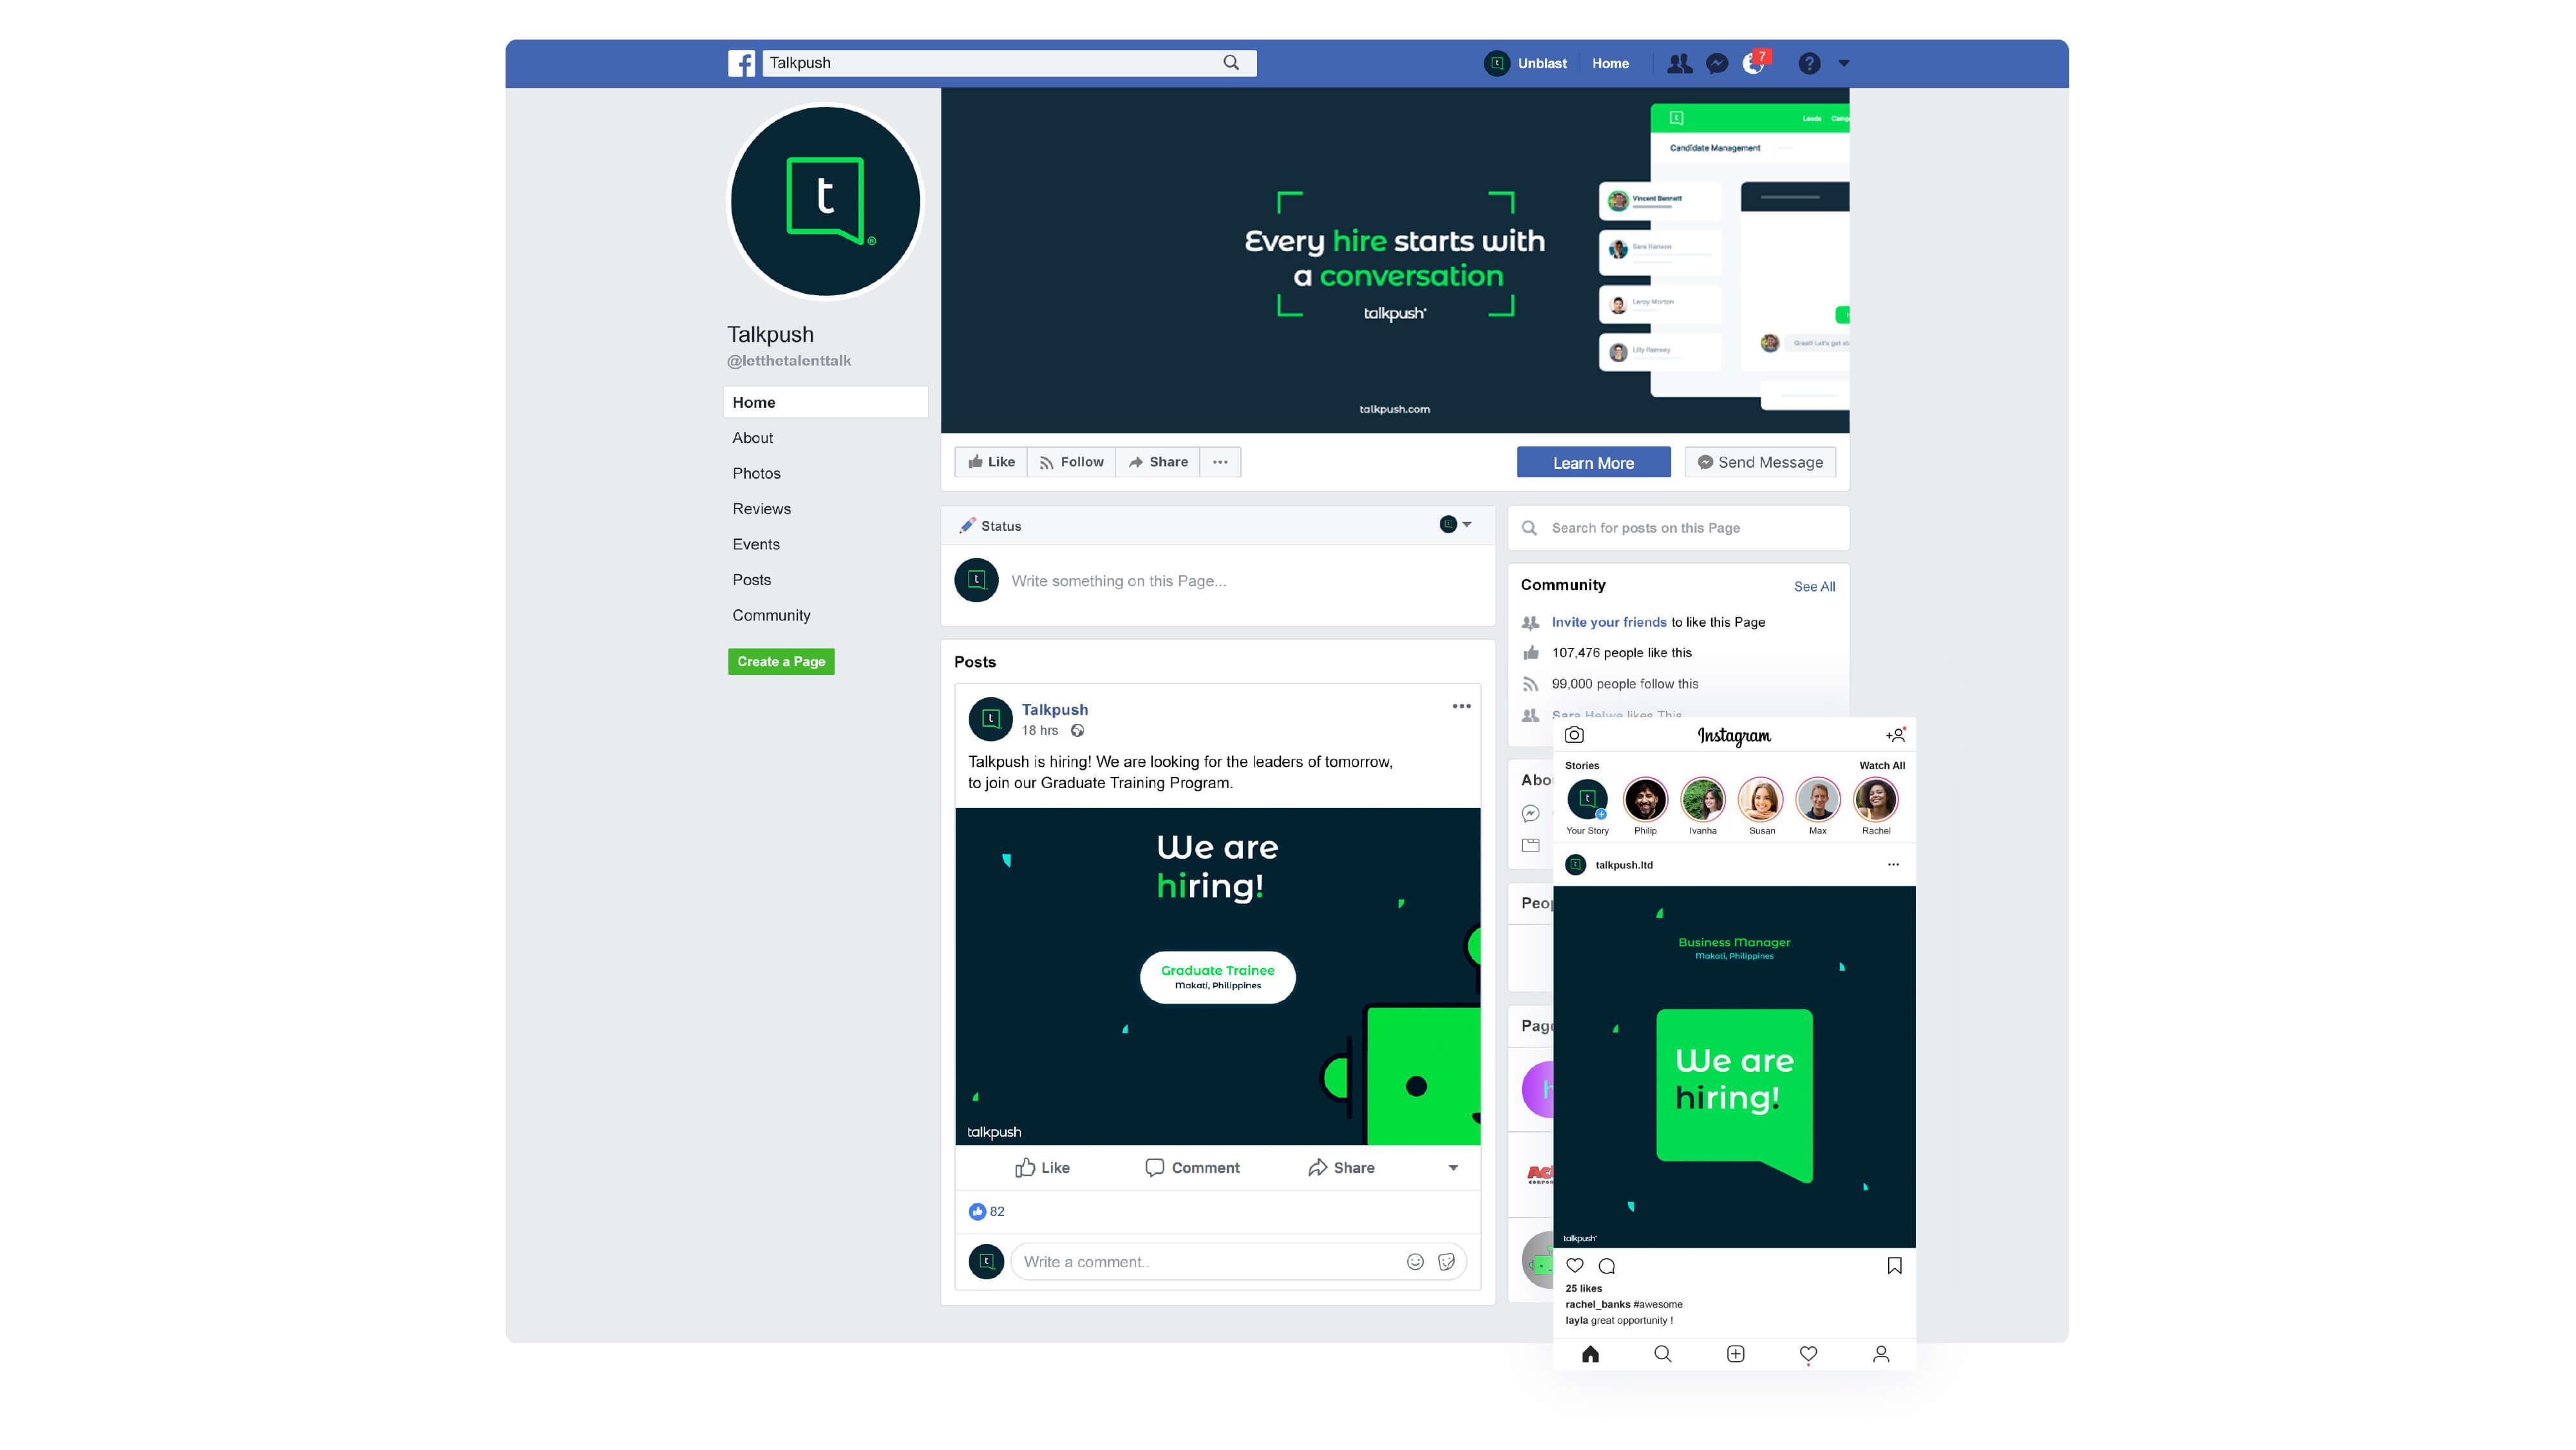 Talkpush Facebook page